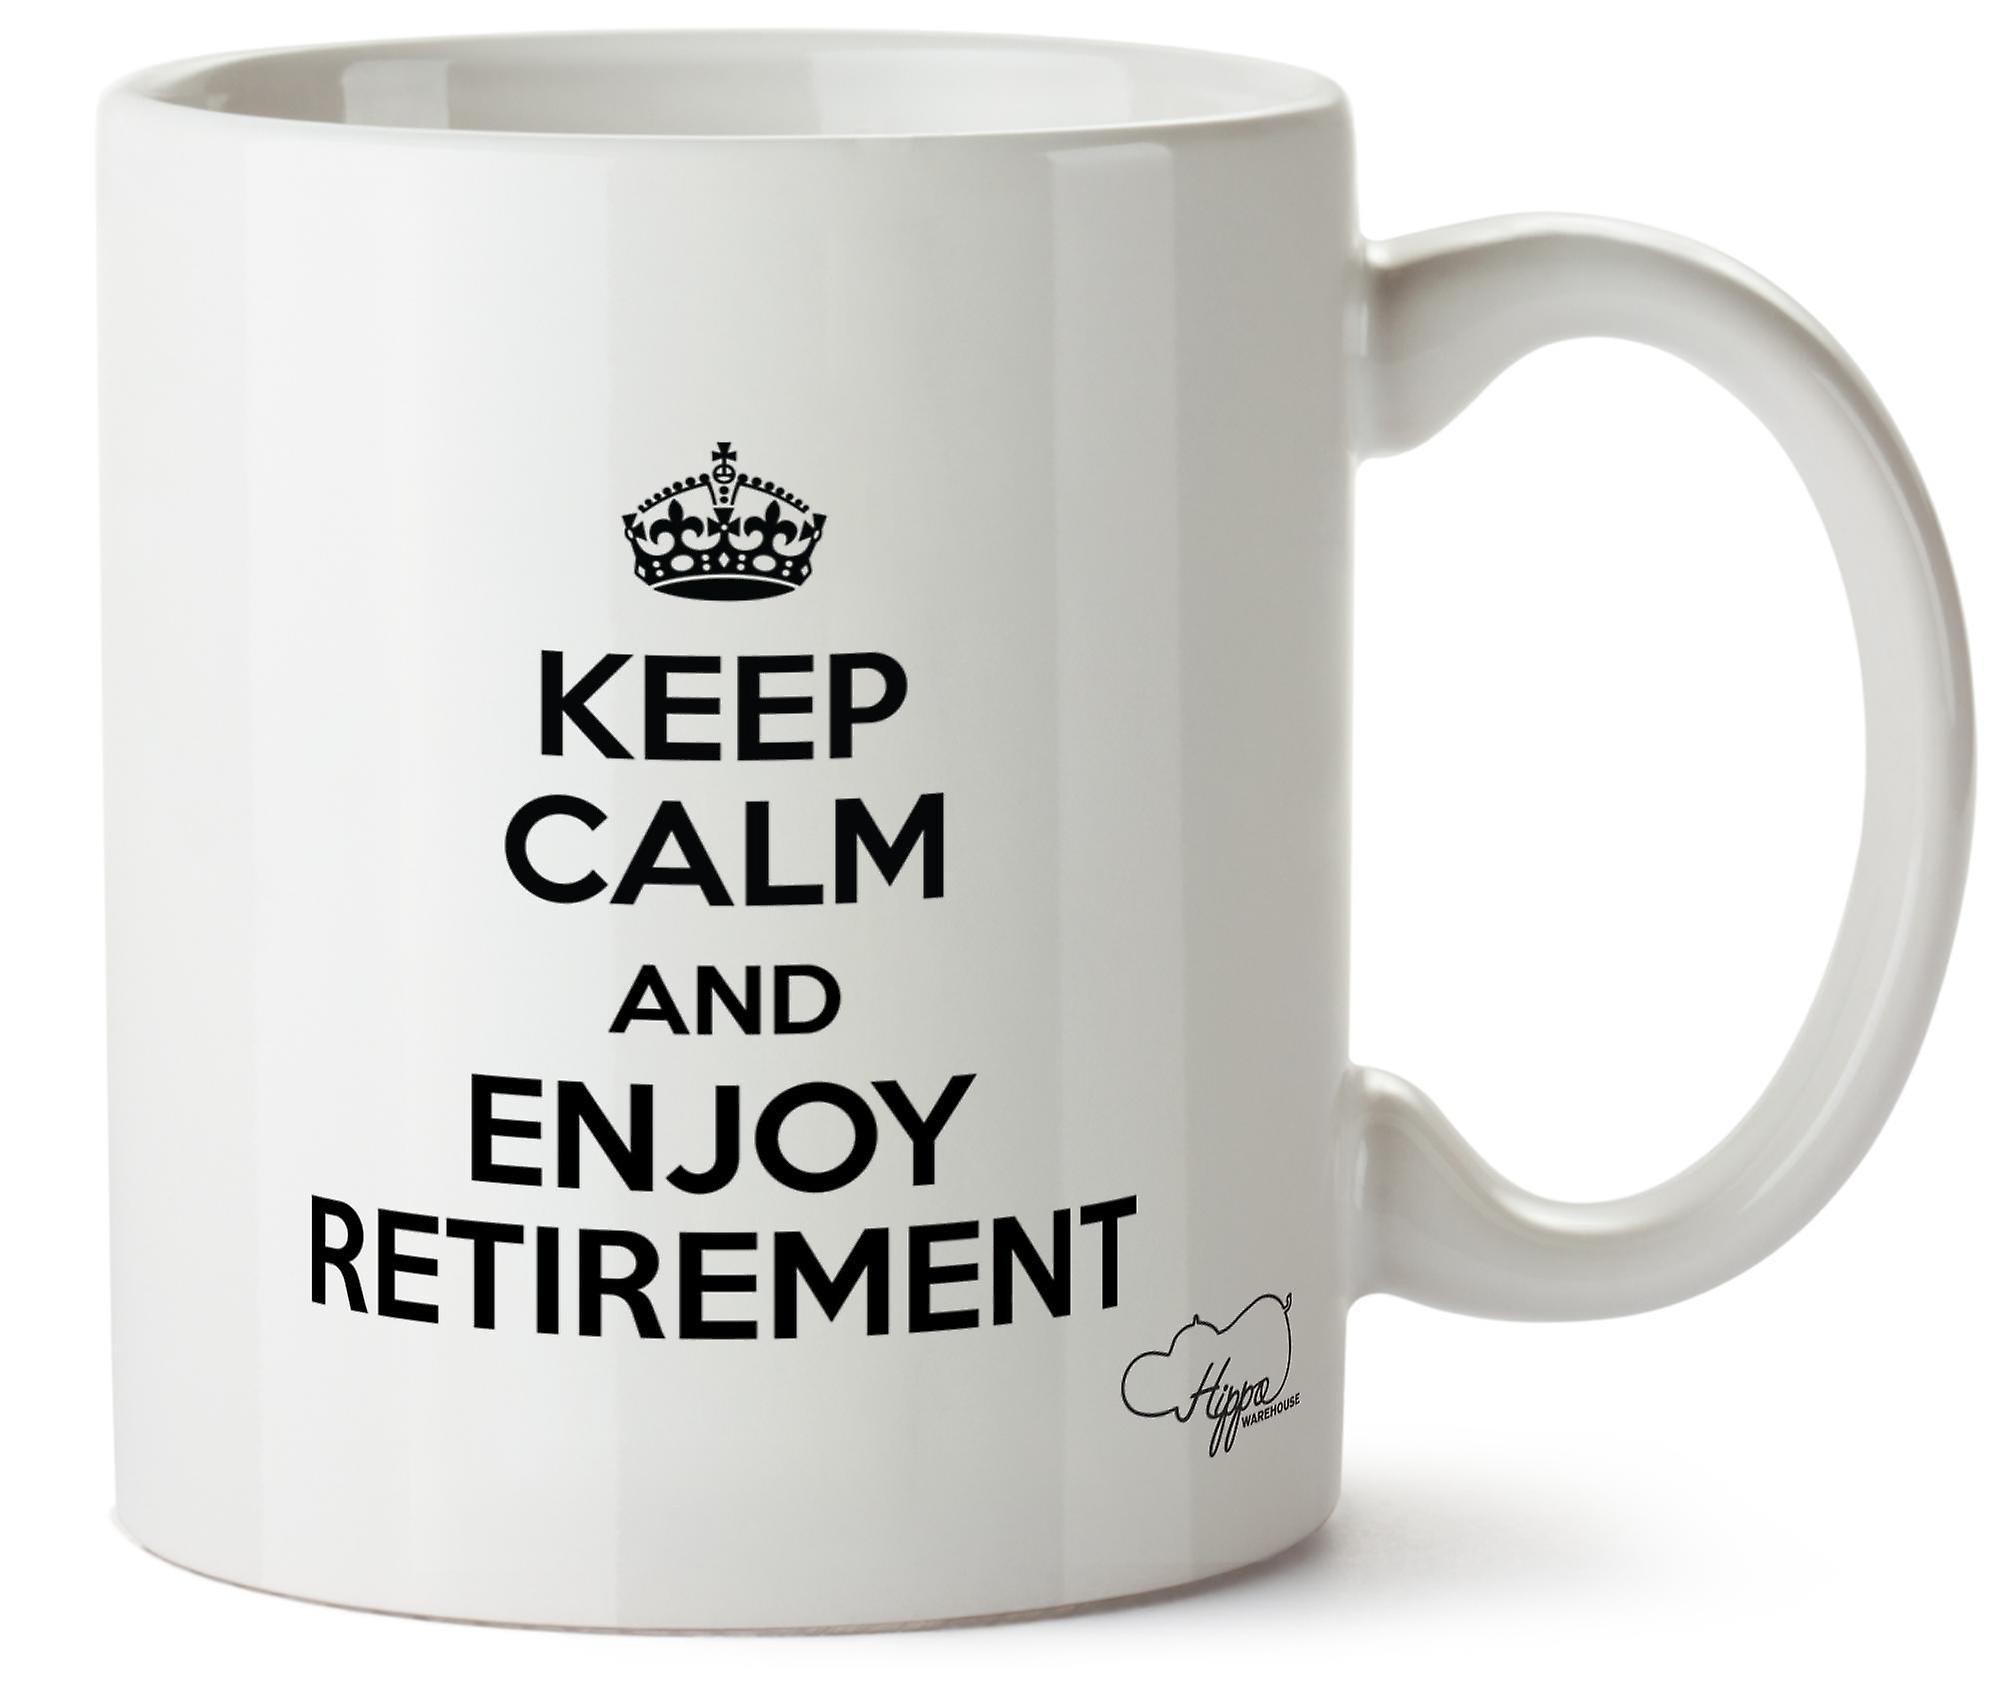 Hippowarehouse Keep Calm And Enjoy Retirement Printed Mug Cup Ceramic 10oz